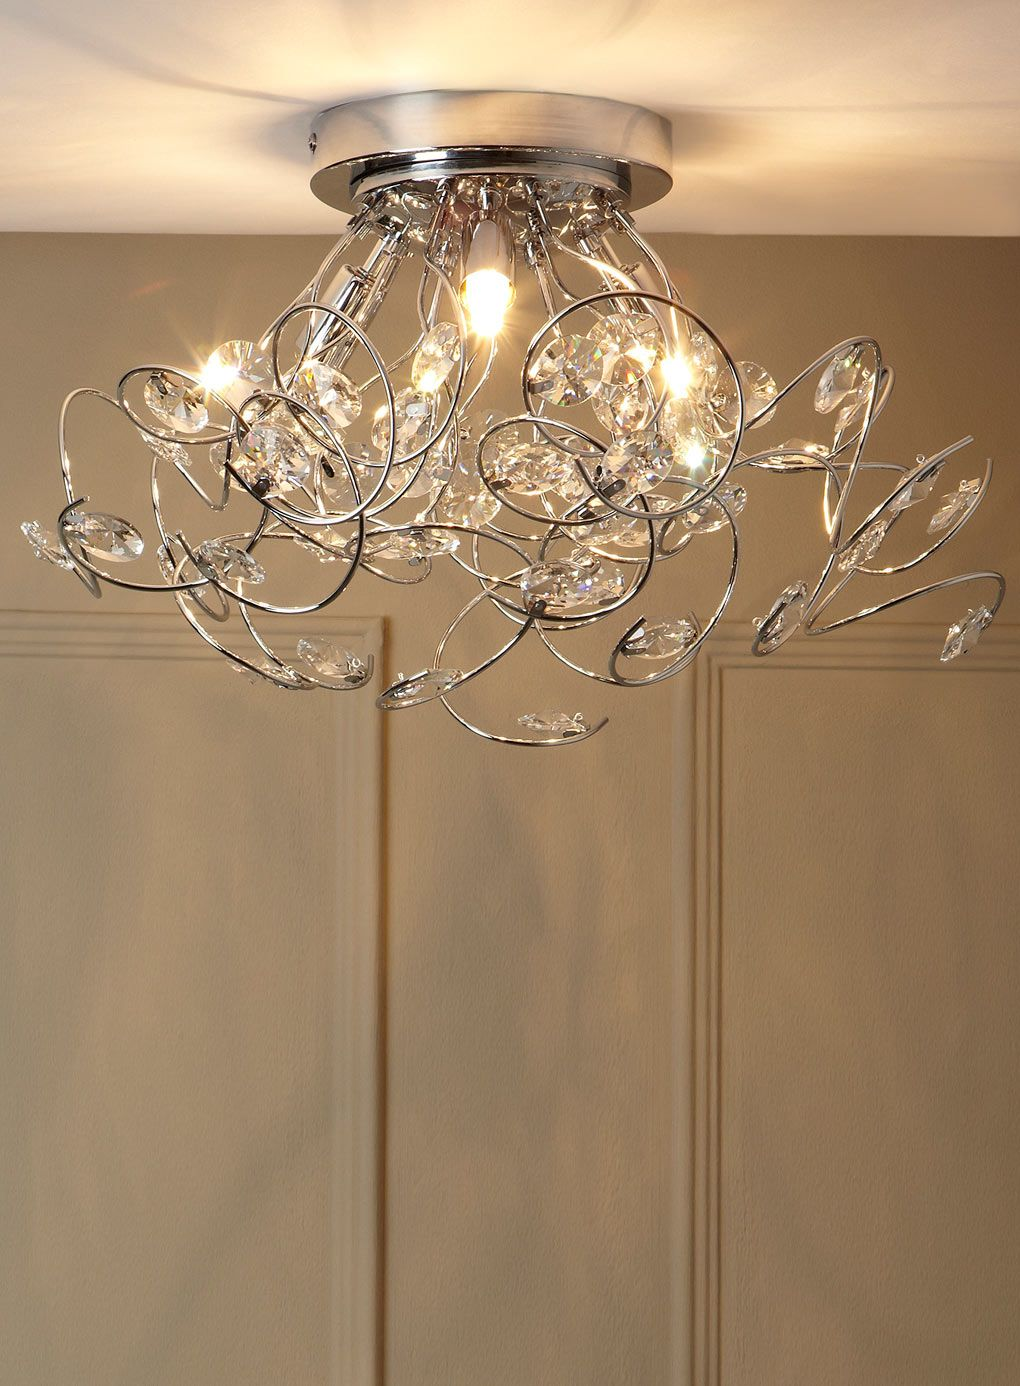 Zoom in lighting sale hallway lighting home lighting living roon flush ceiling